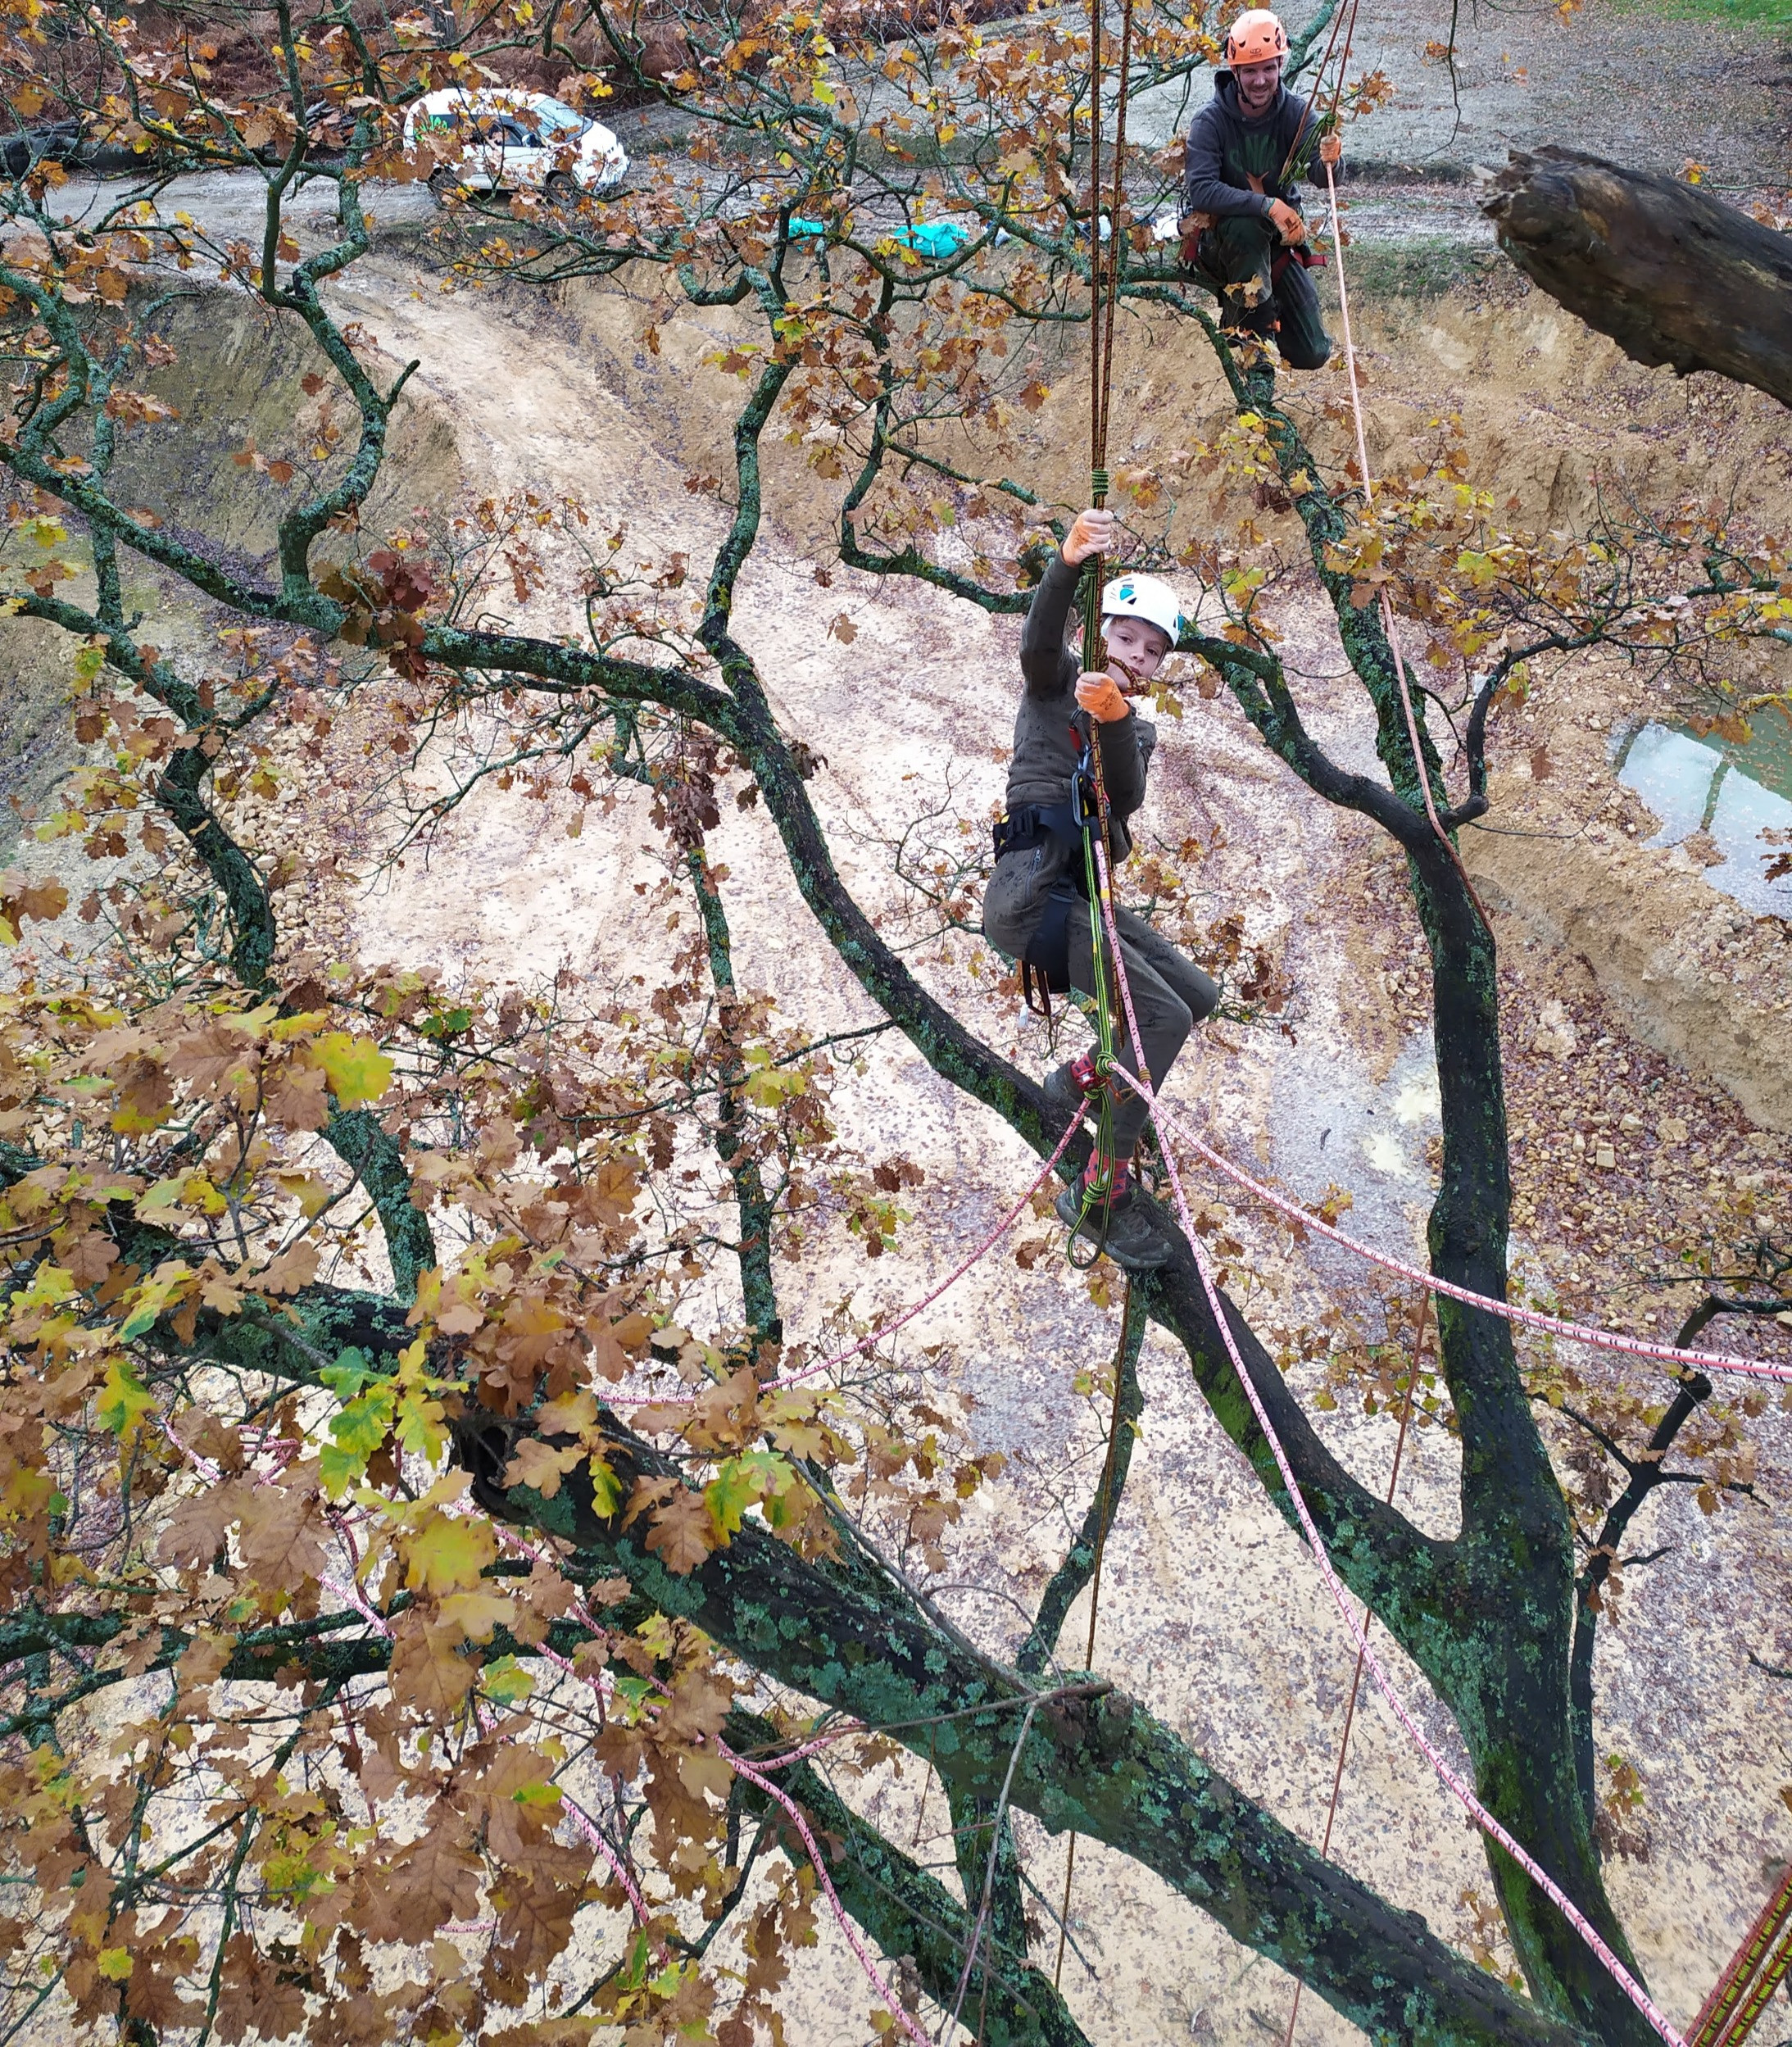 TREE CLIMBING ADVENTURE up to 4 people